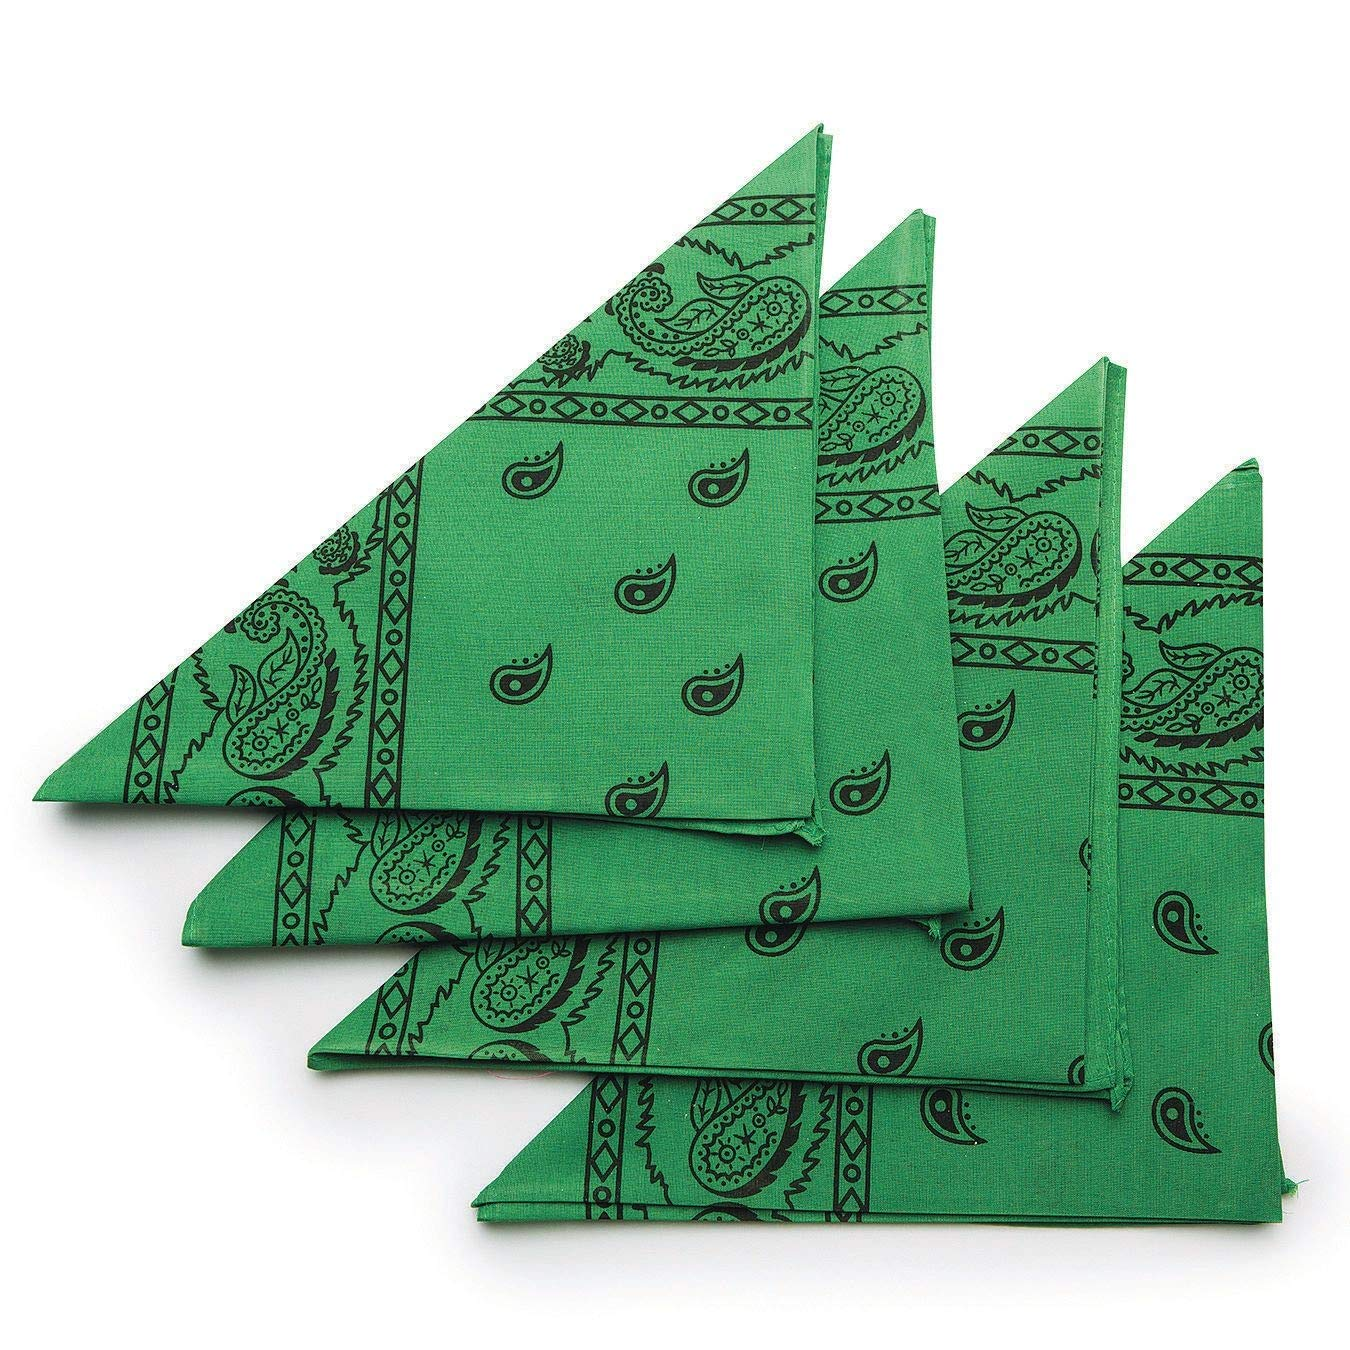 S&S WORLDWIDE Green Bandanas (Pack of 12)